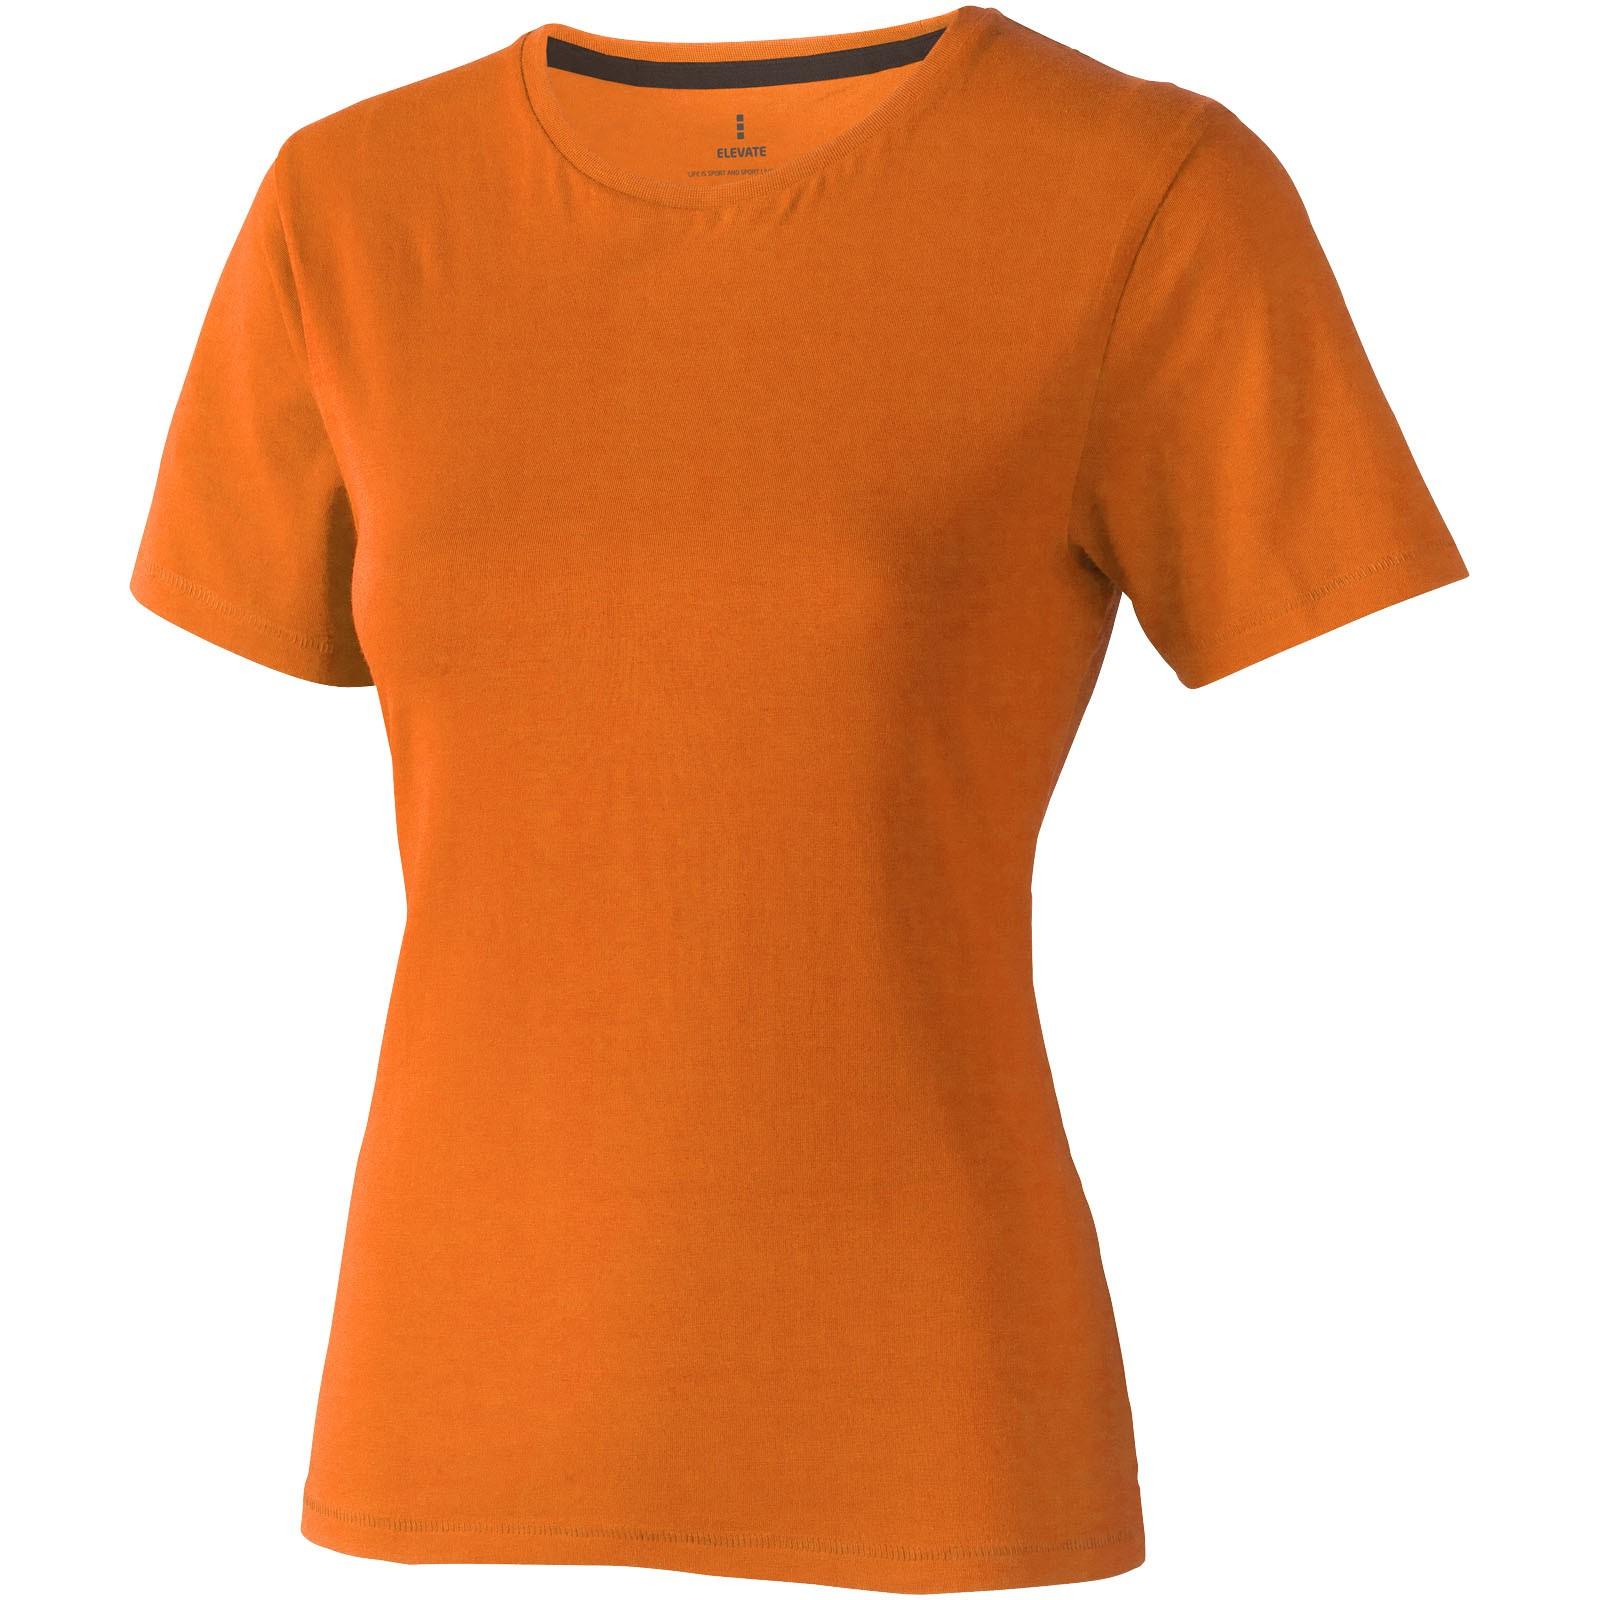 Nanaimo short sleeve women's T-shirt - Orange / XS